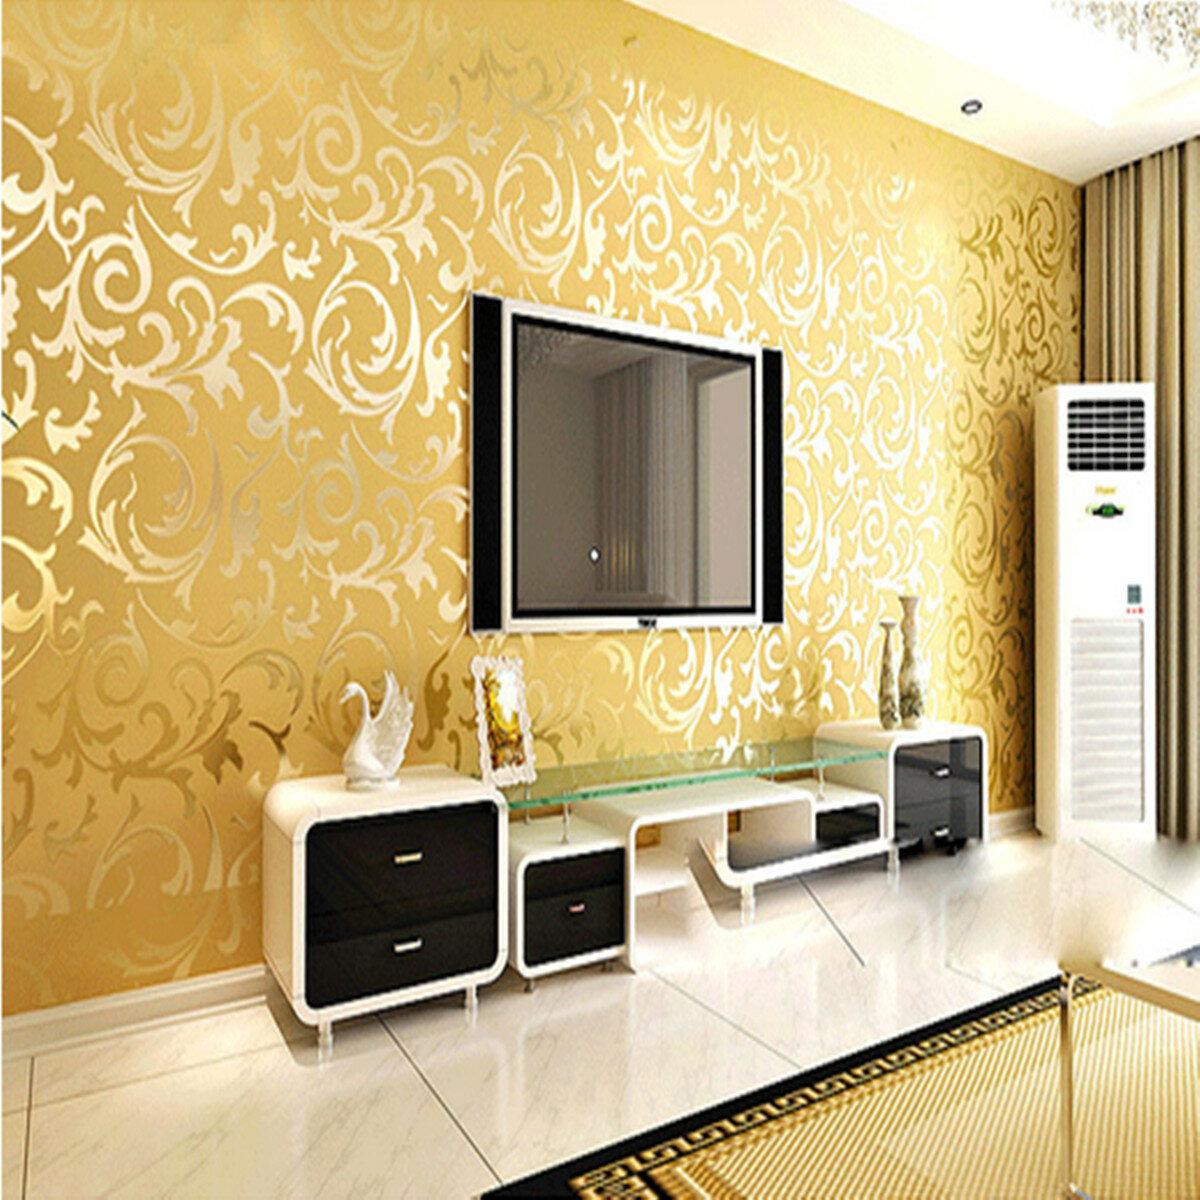 10mx53cm Wallpaper Rolls Silver Golden Apricot Luxury Embossed ...